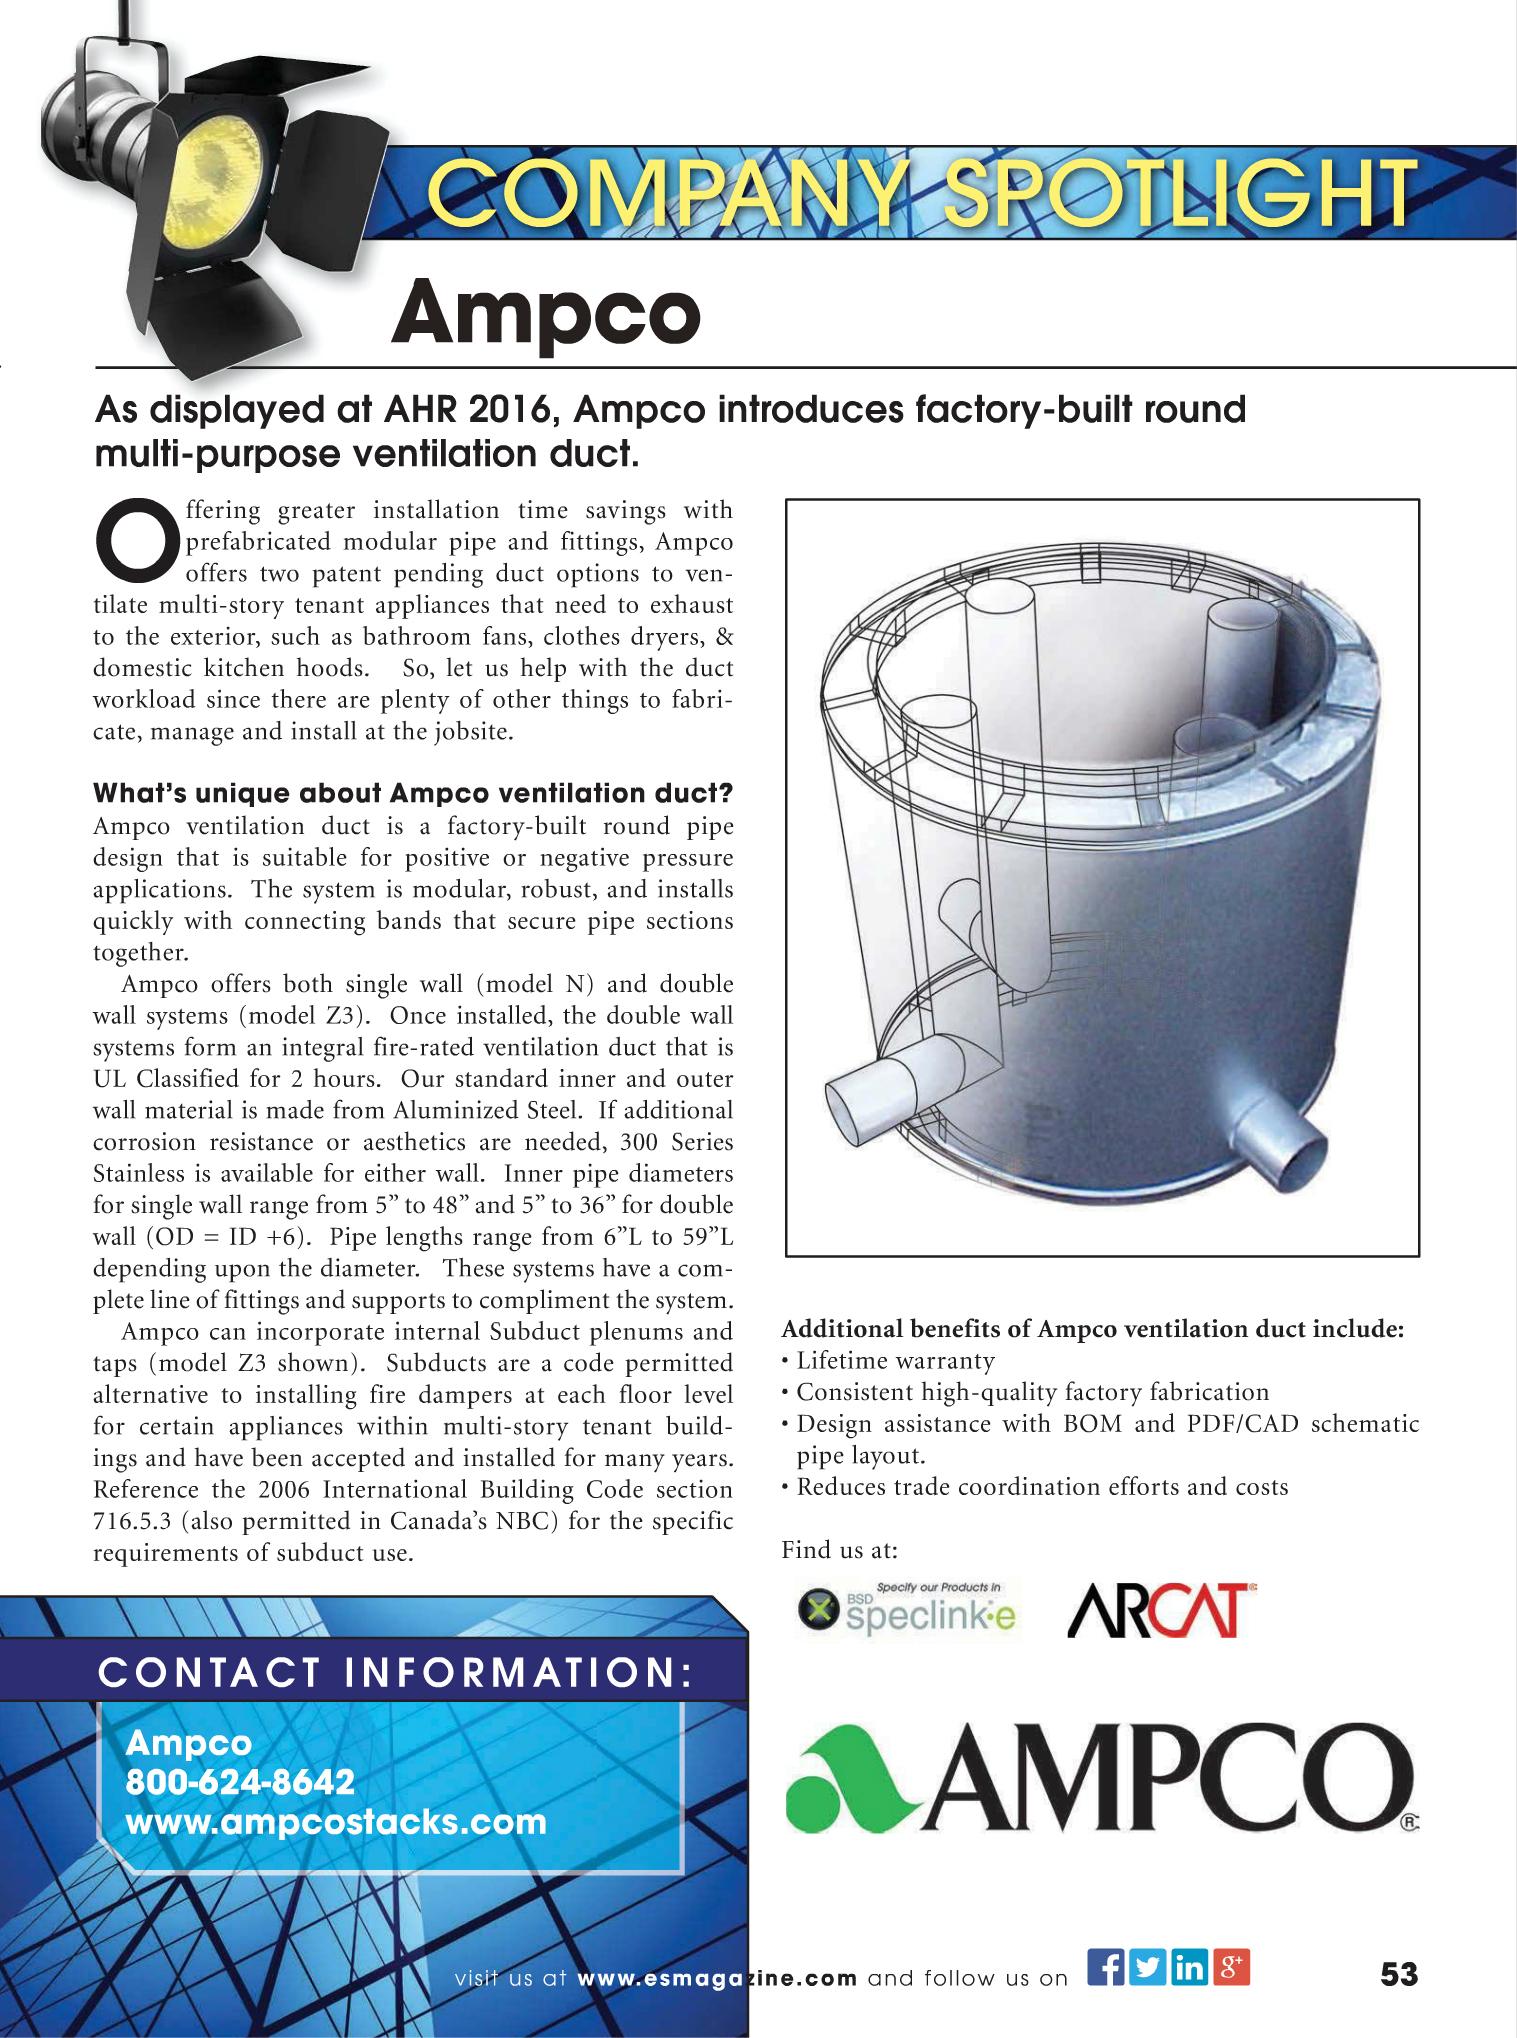 AMPCO - ES Spotlight